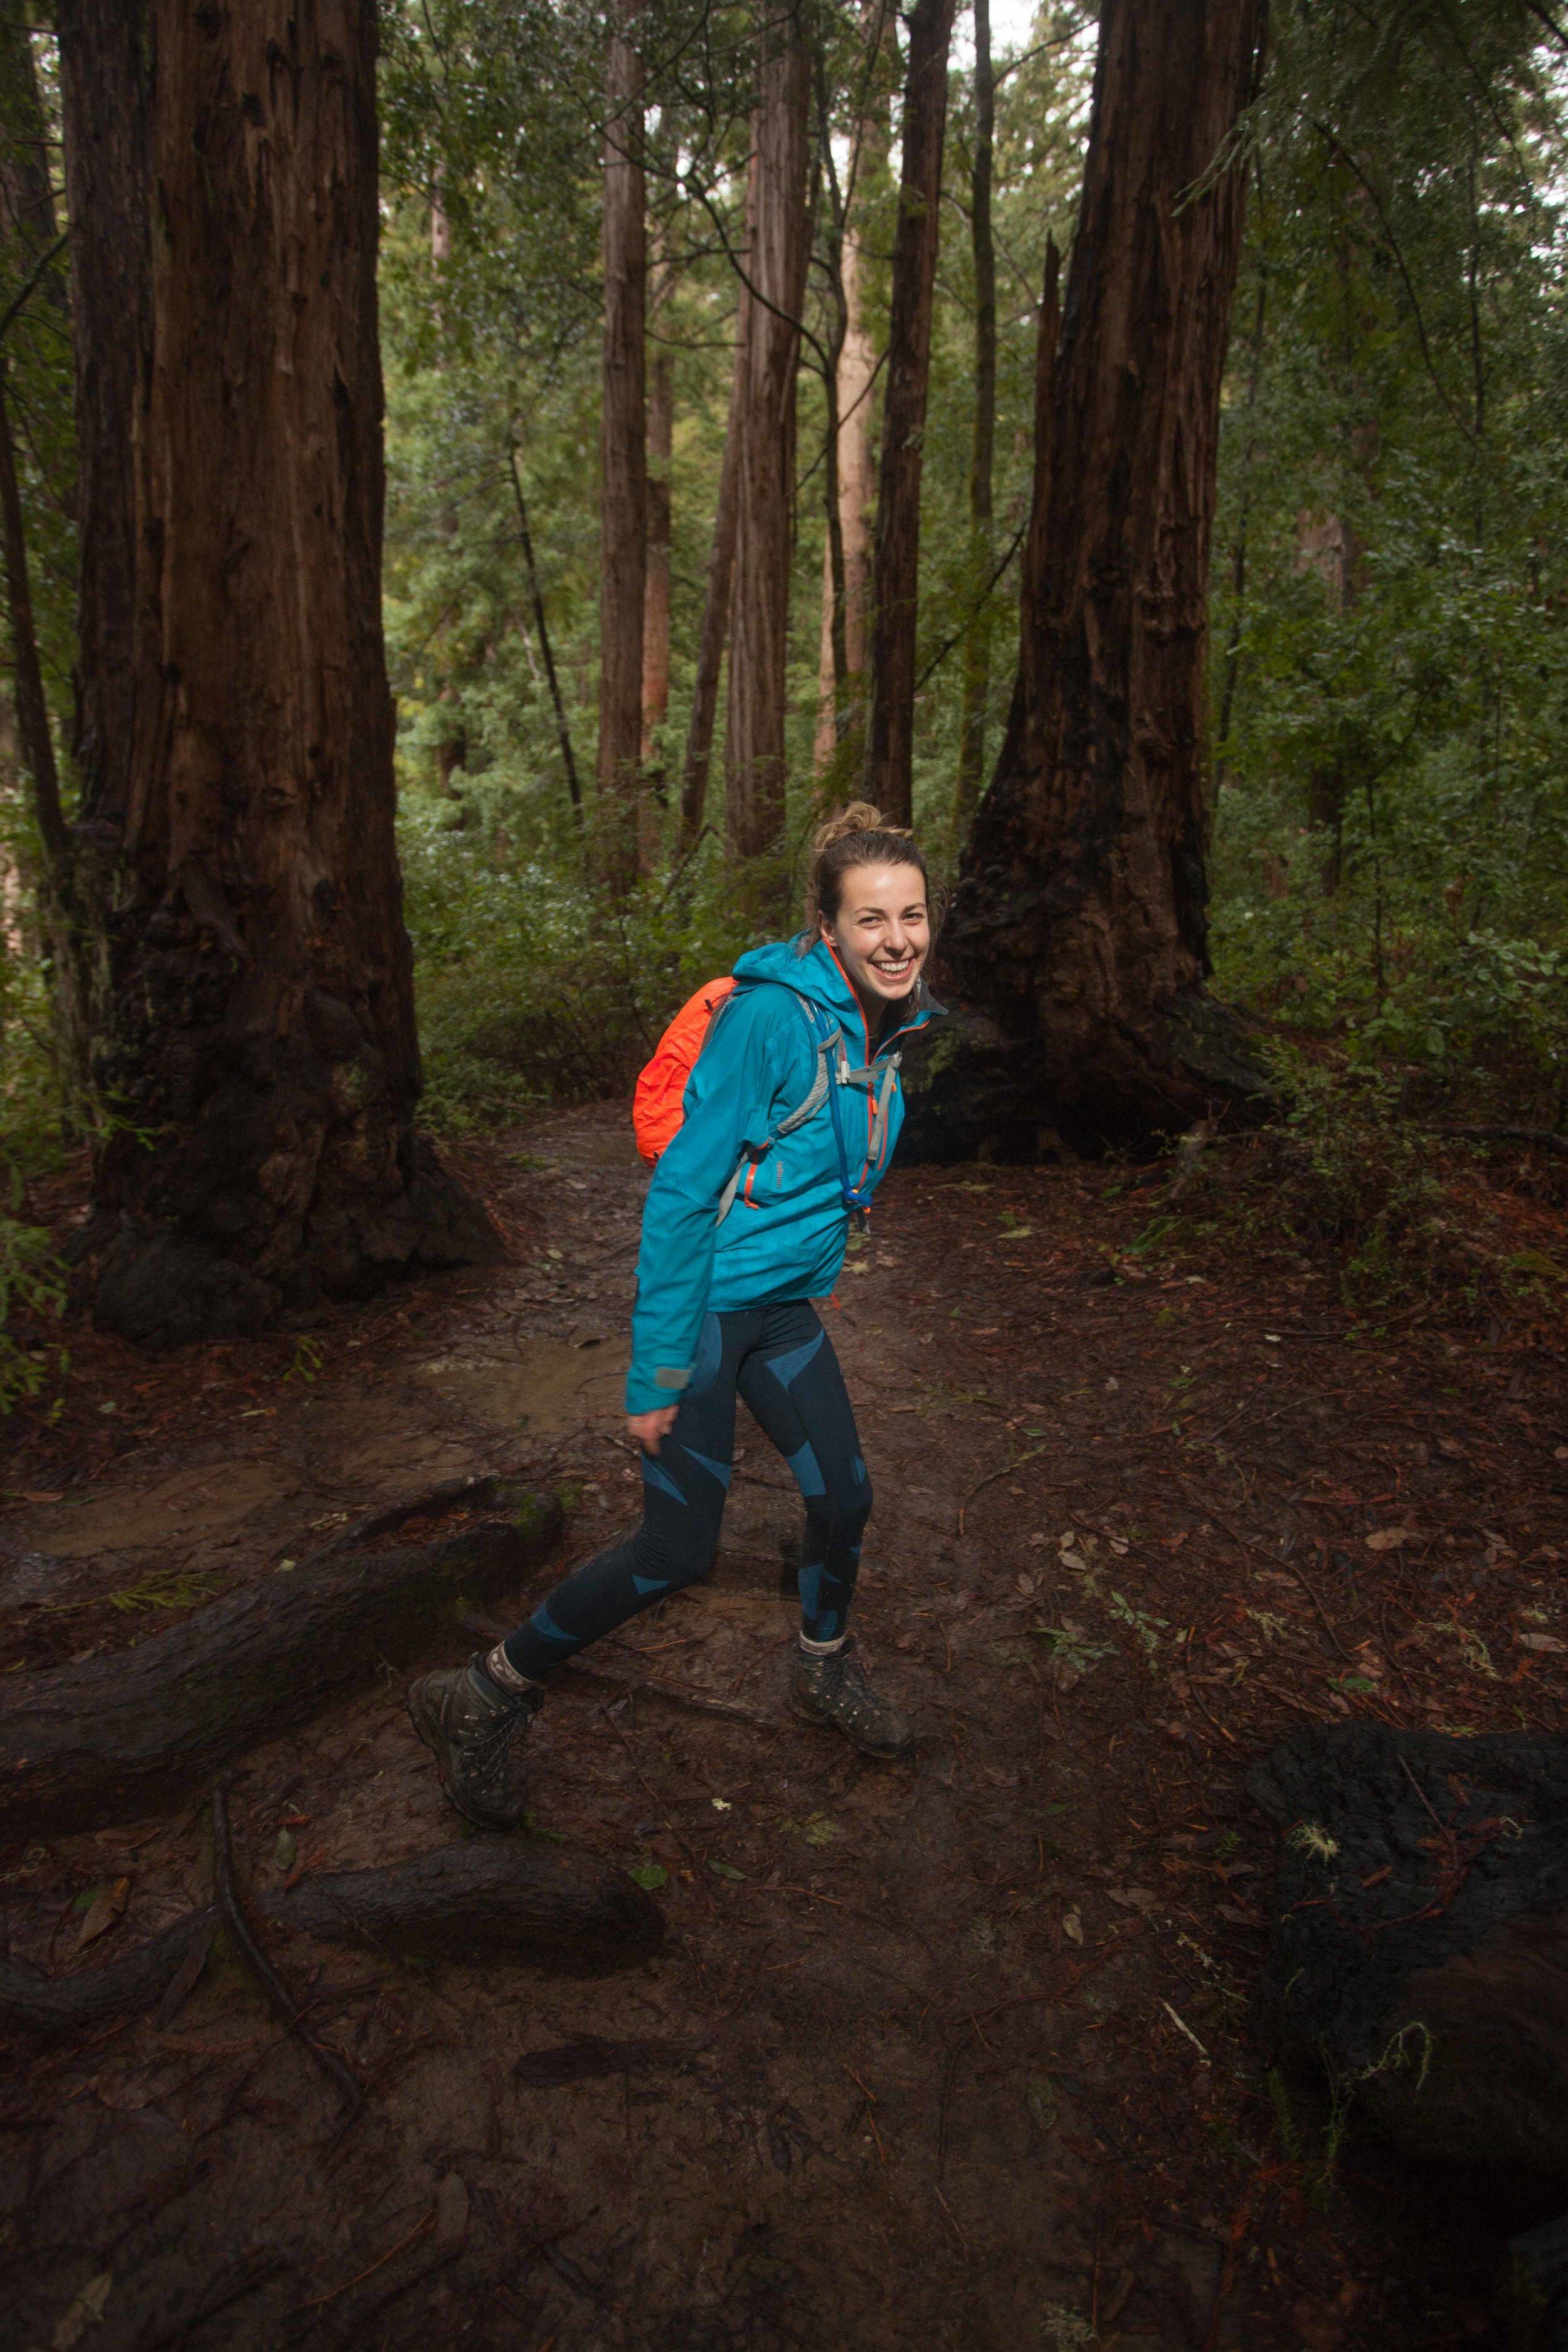 My beautiful girlfriend in the redwoods of California!